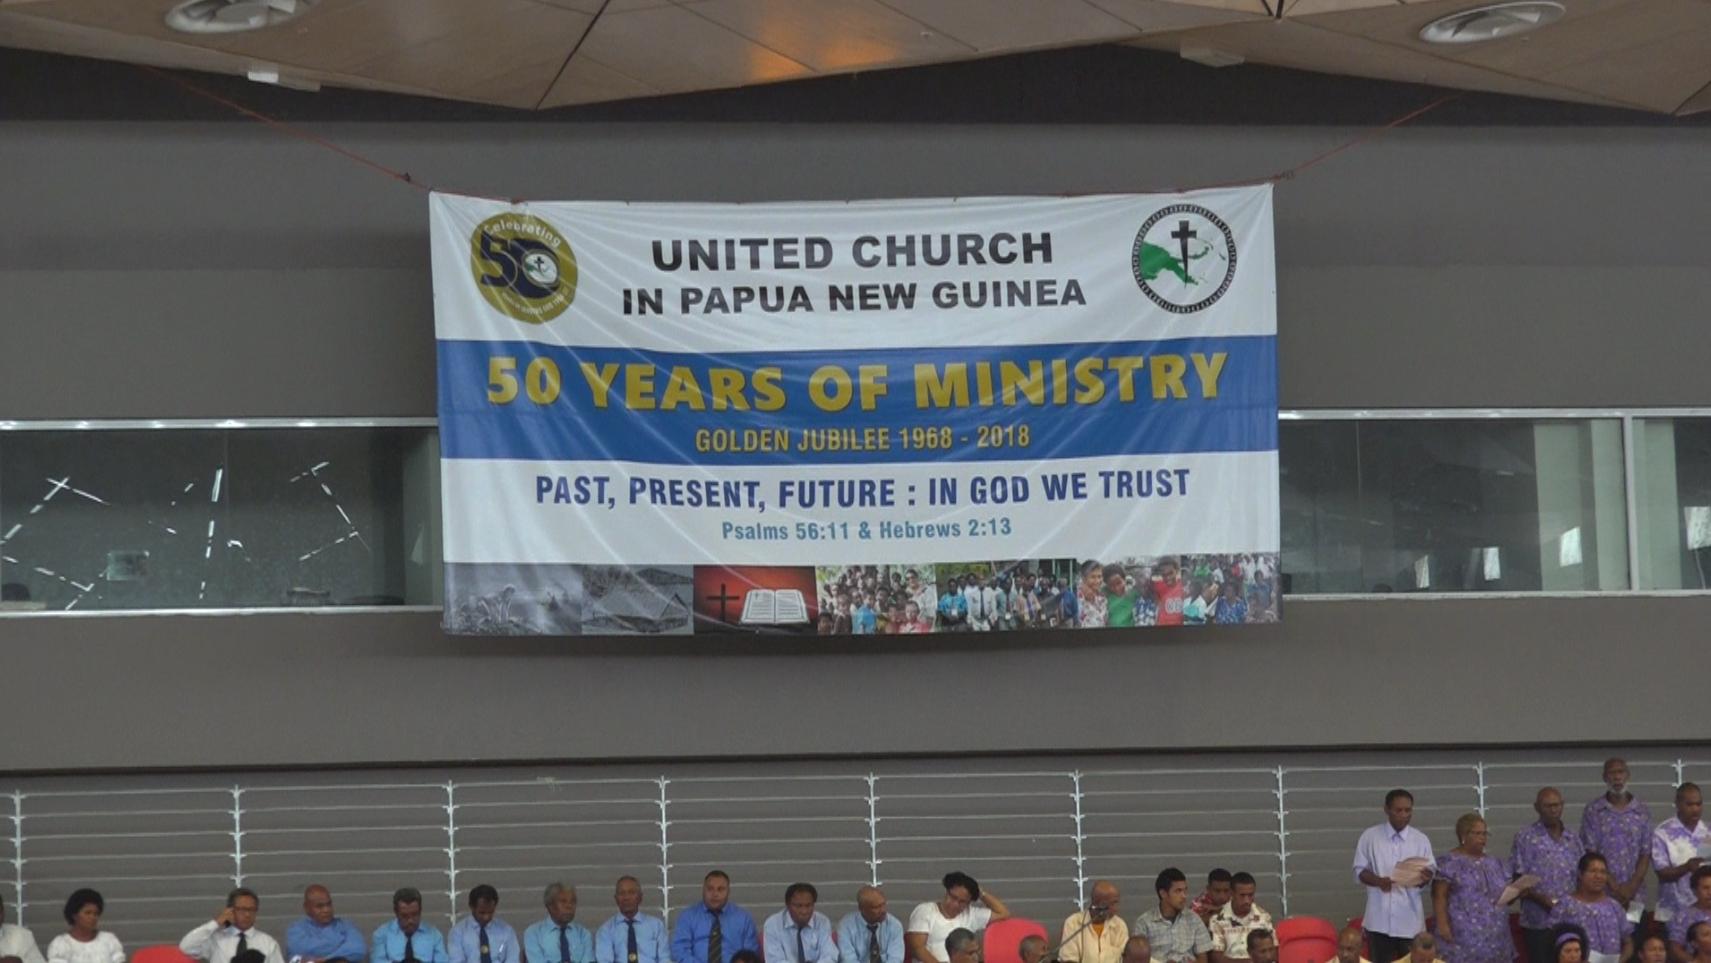 United Church of Papua New Guinea Celebrates Golden Jubilee.